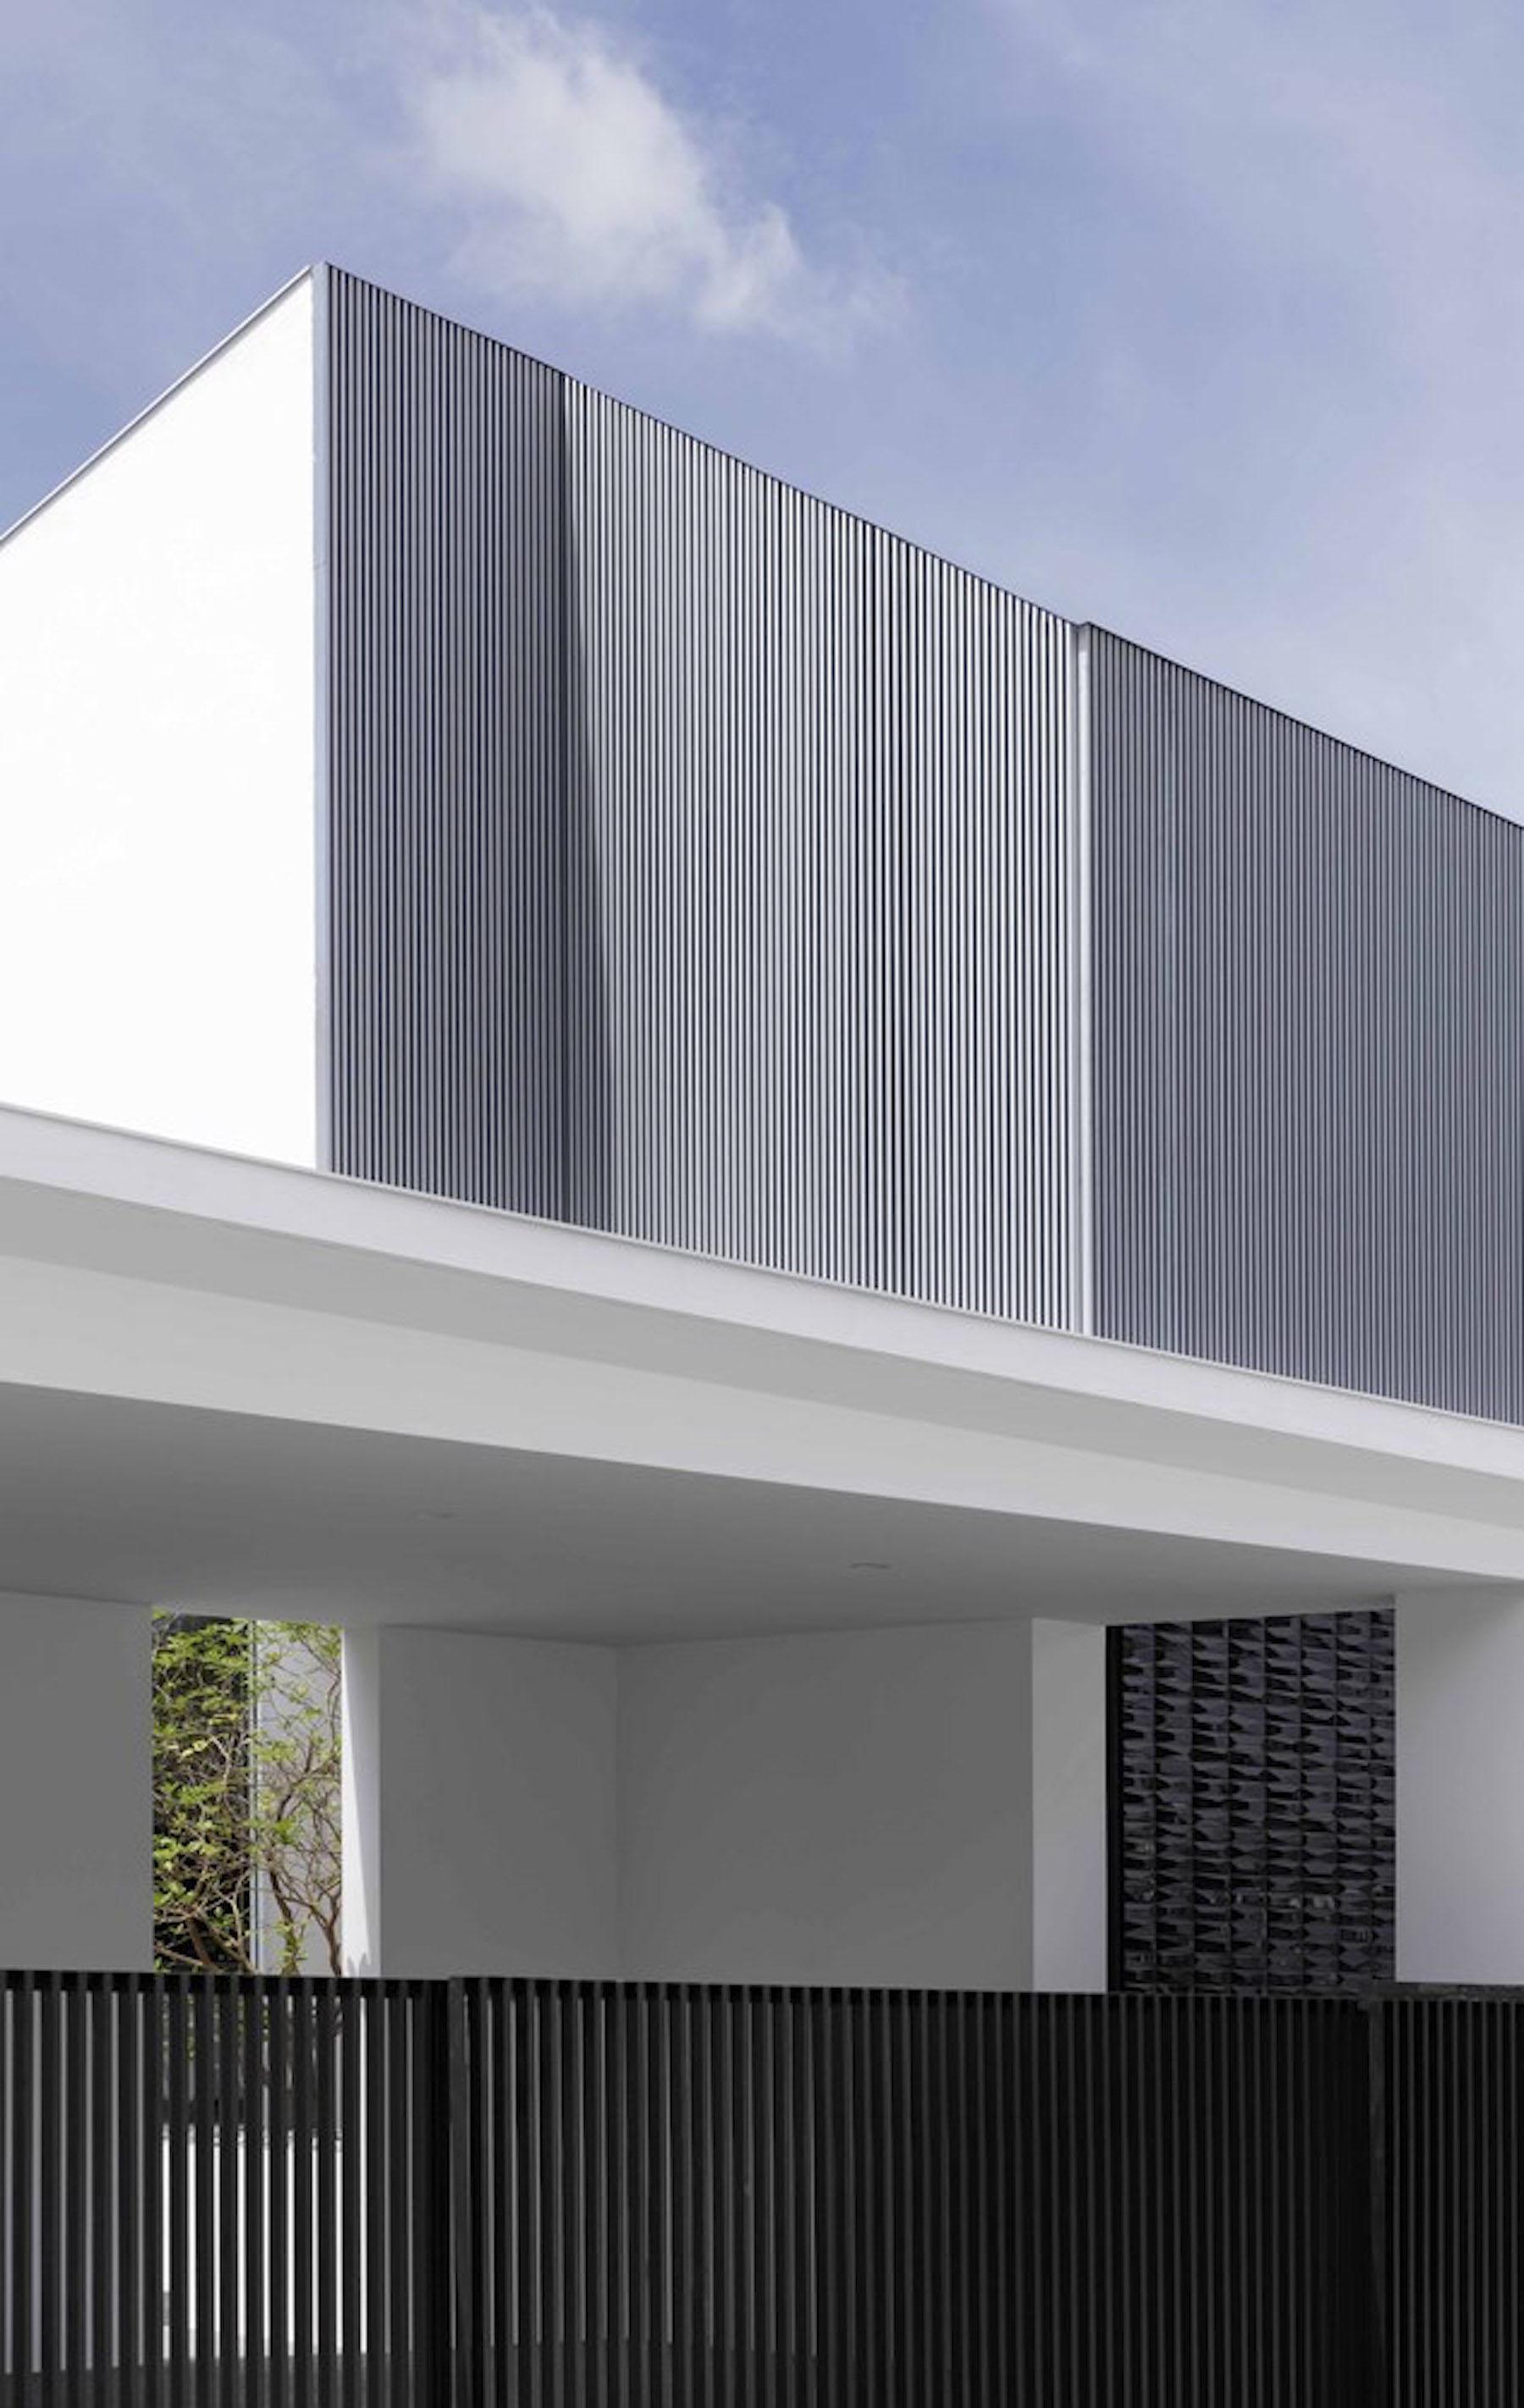 iGNANT-Architecture-Ayutt-And-Associates-Design-White-Box-House-16